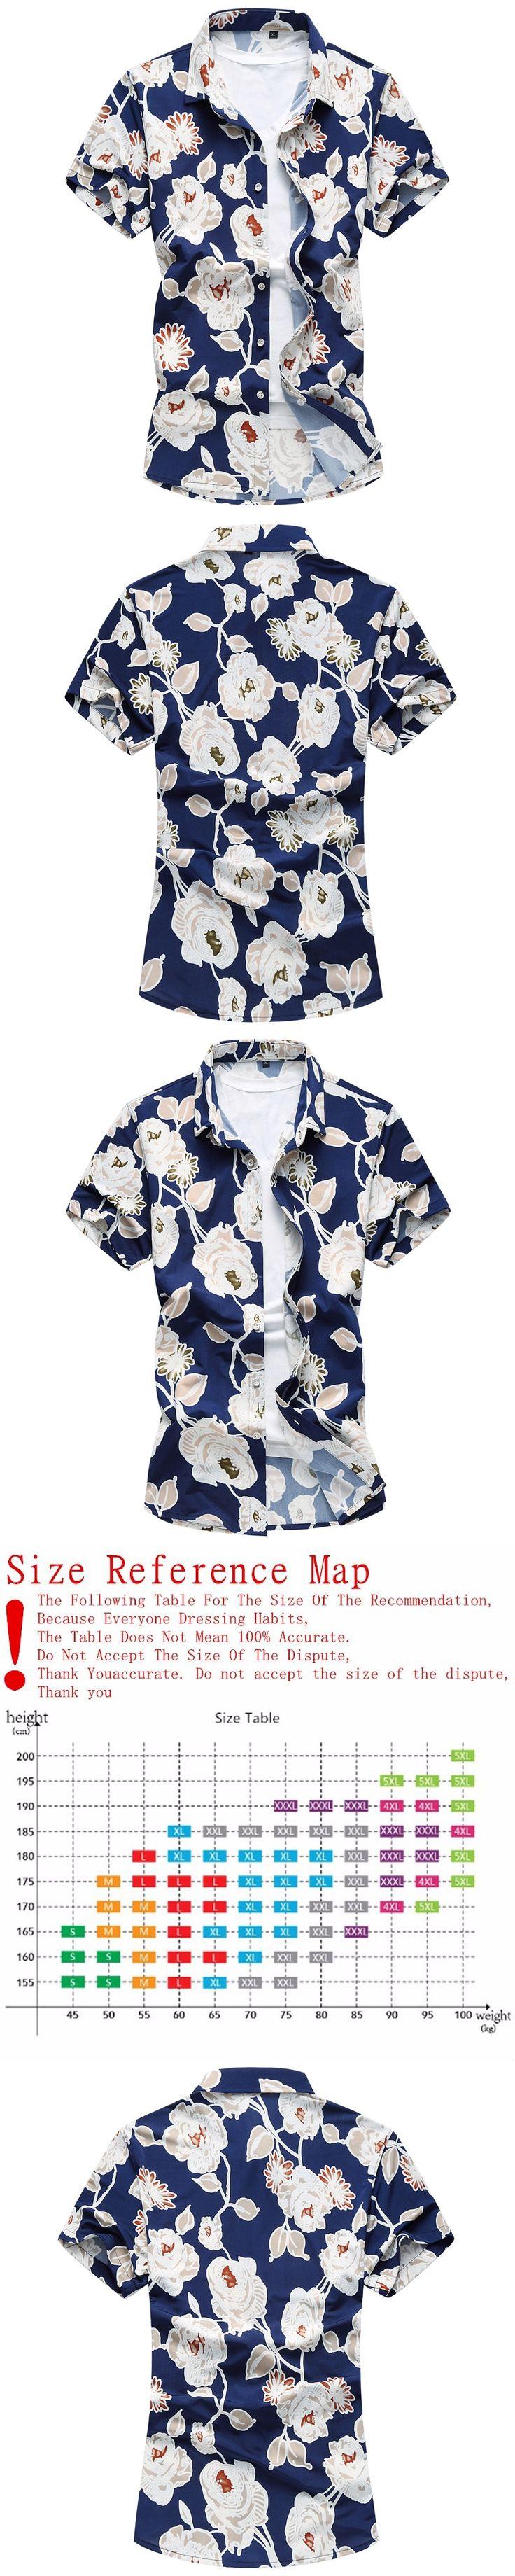 Mens Hawaiian Shirt 2017 Male Casual camisa masculina Printed Beach Shirts Short Sleeve brand clothing Plus size 6XL 007